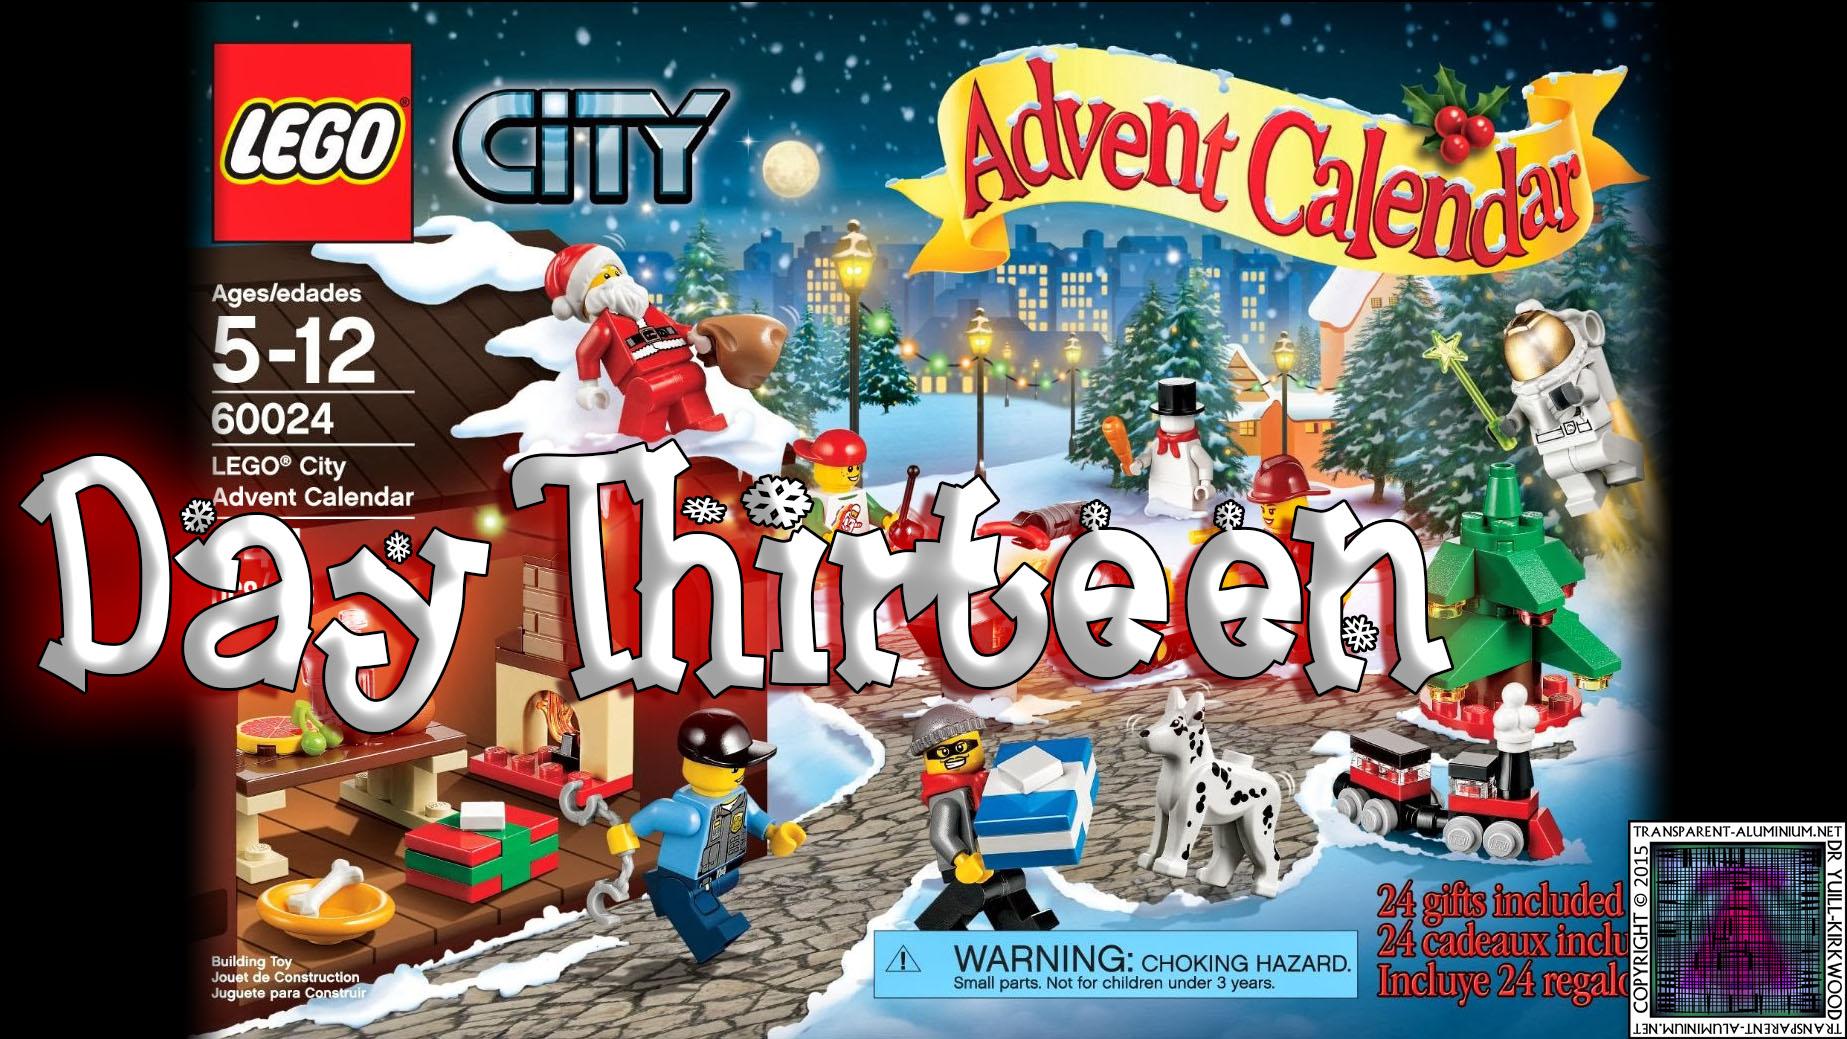 LEGO City Advent Calendar 60024 thumb - Day 13